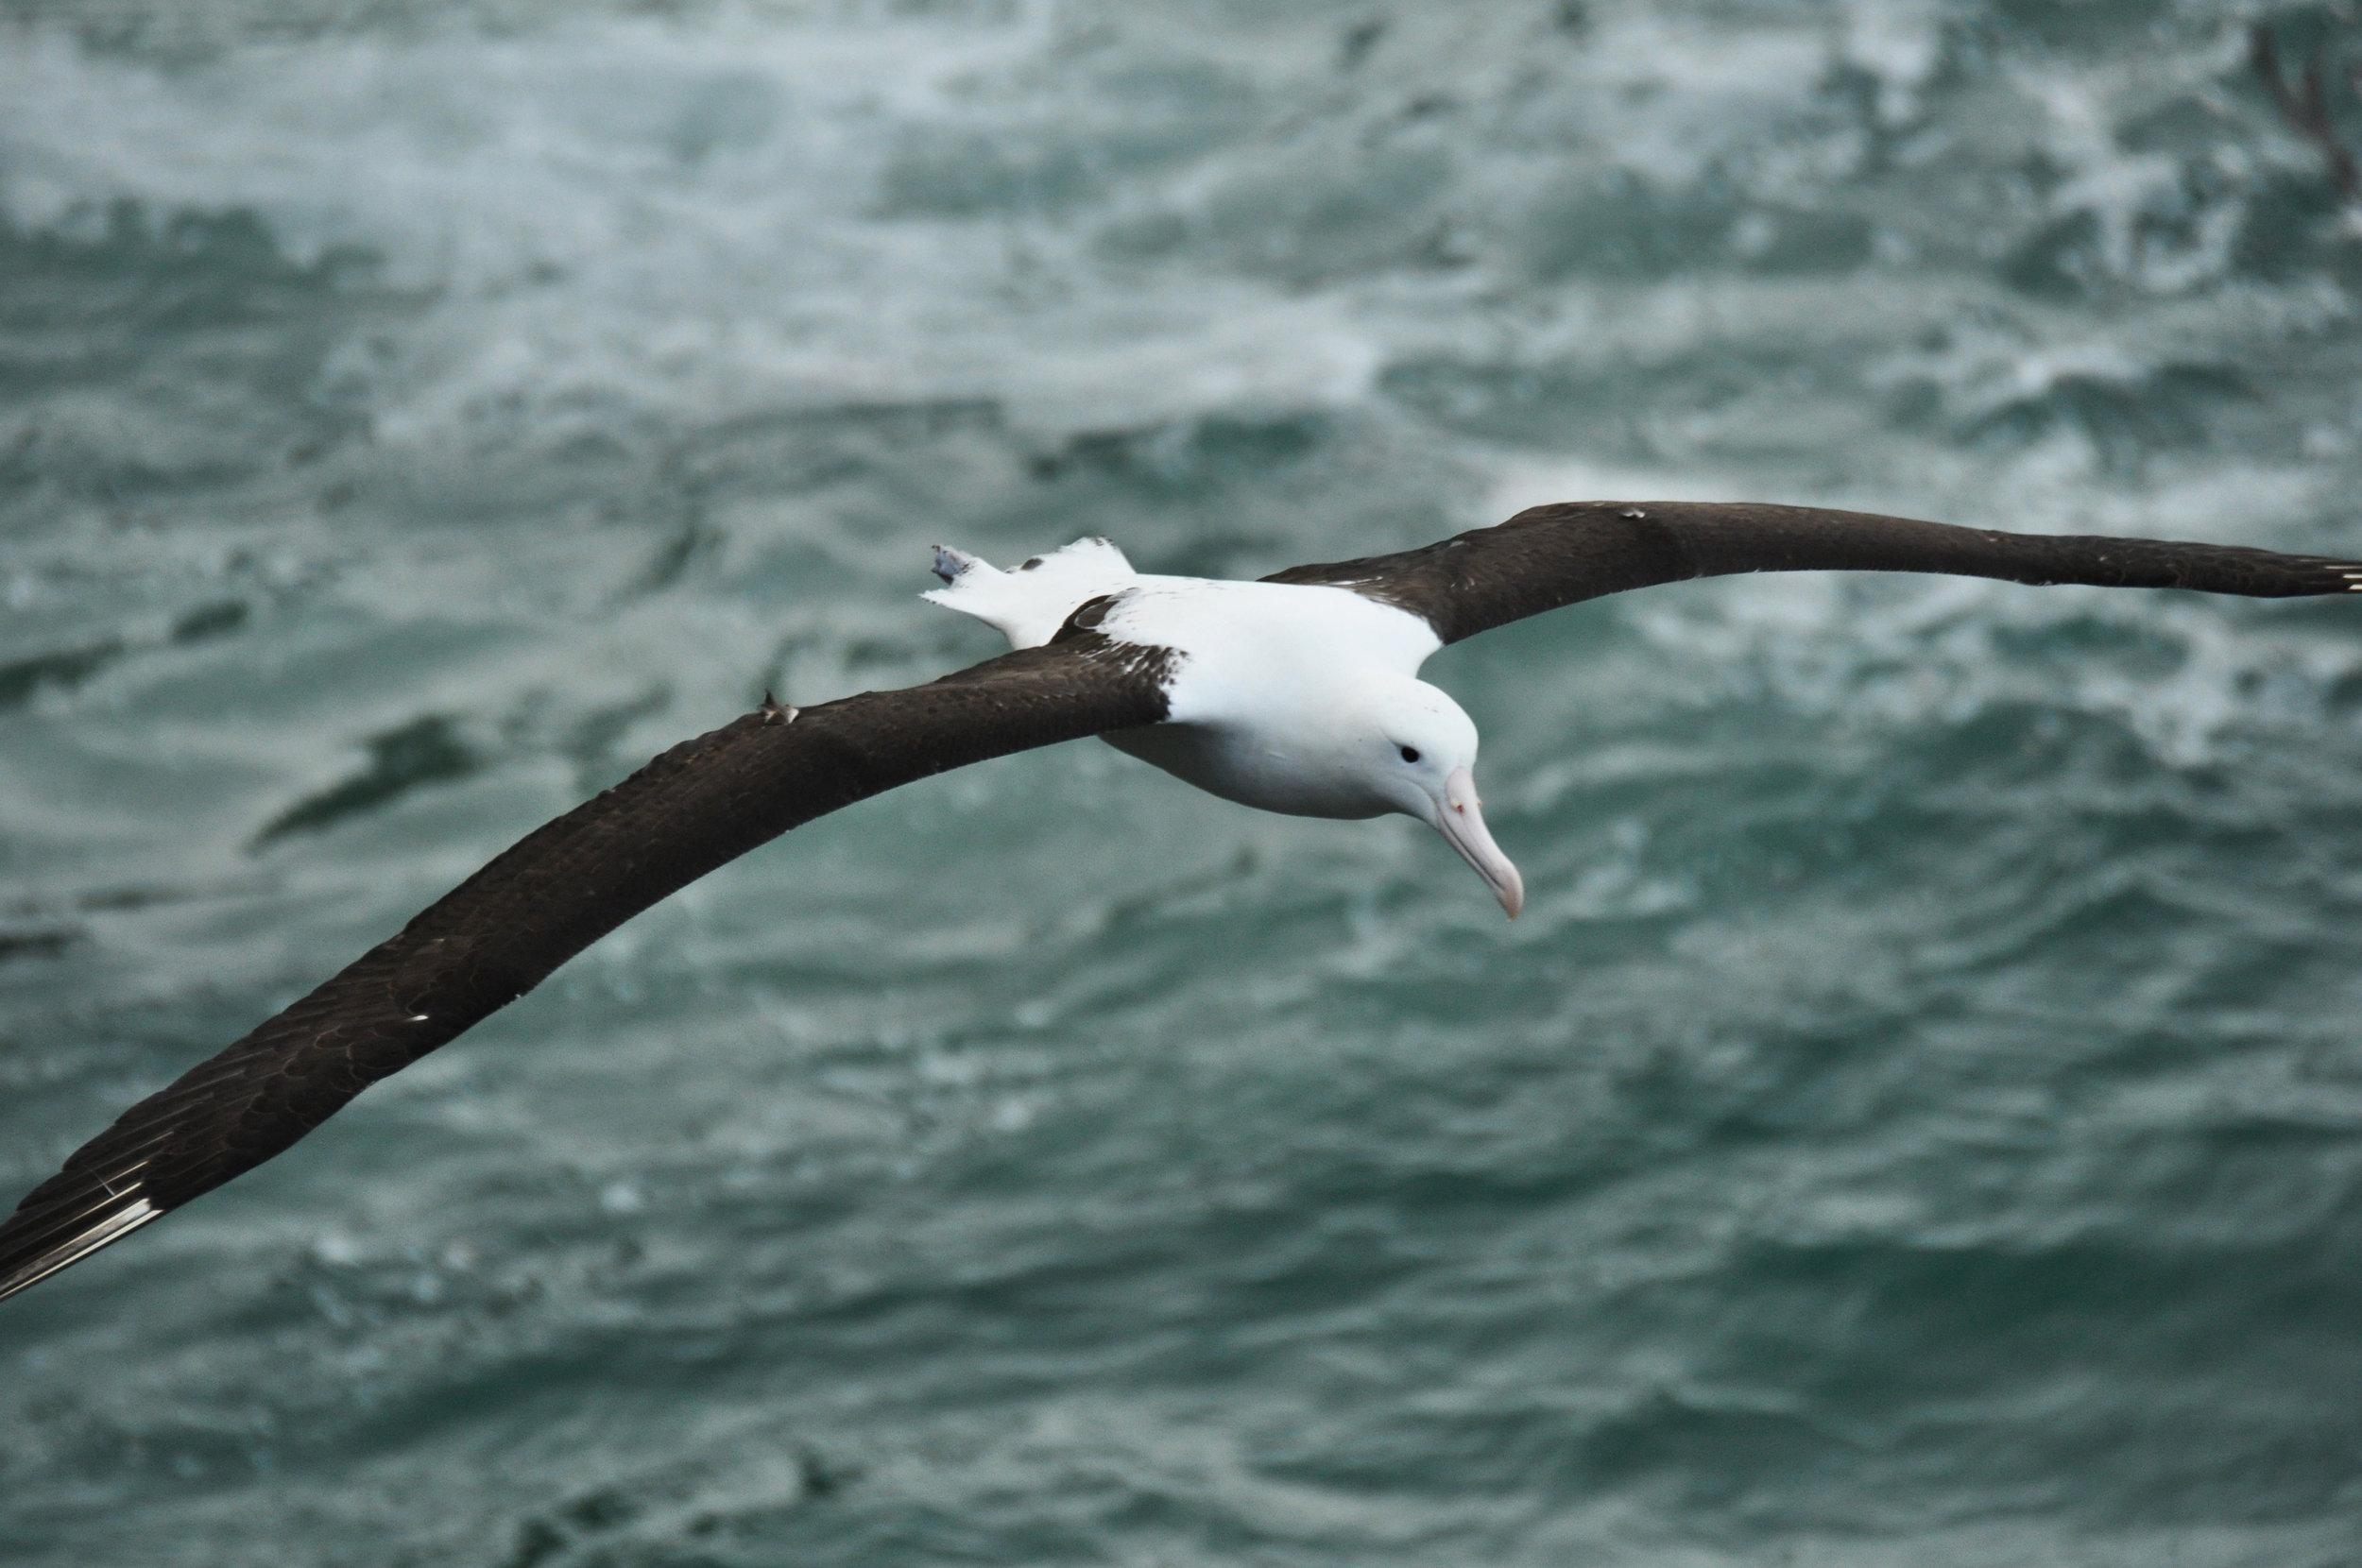 Royal Albatross, Otago, New Zealand (image care of the Royal Albatross Centre).